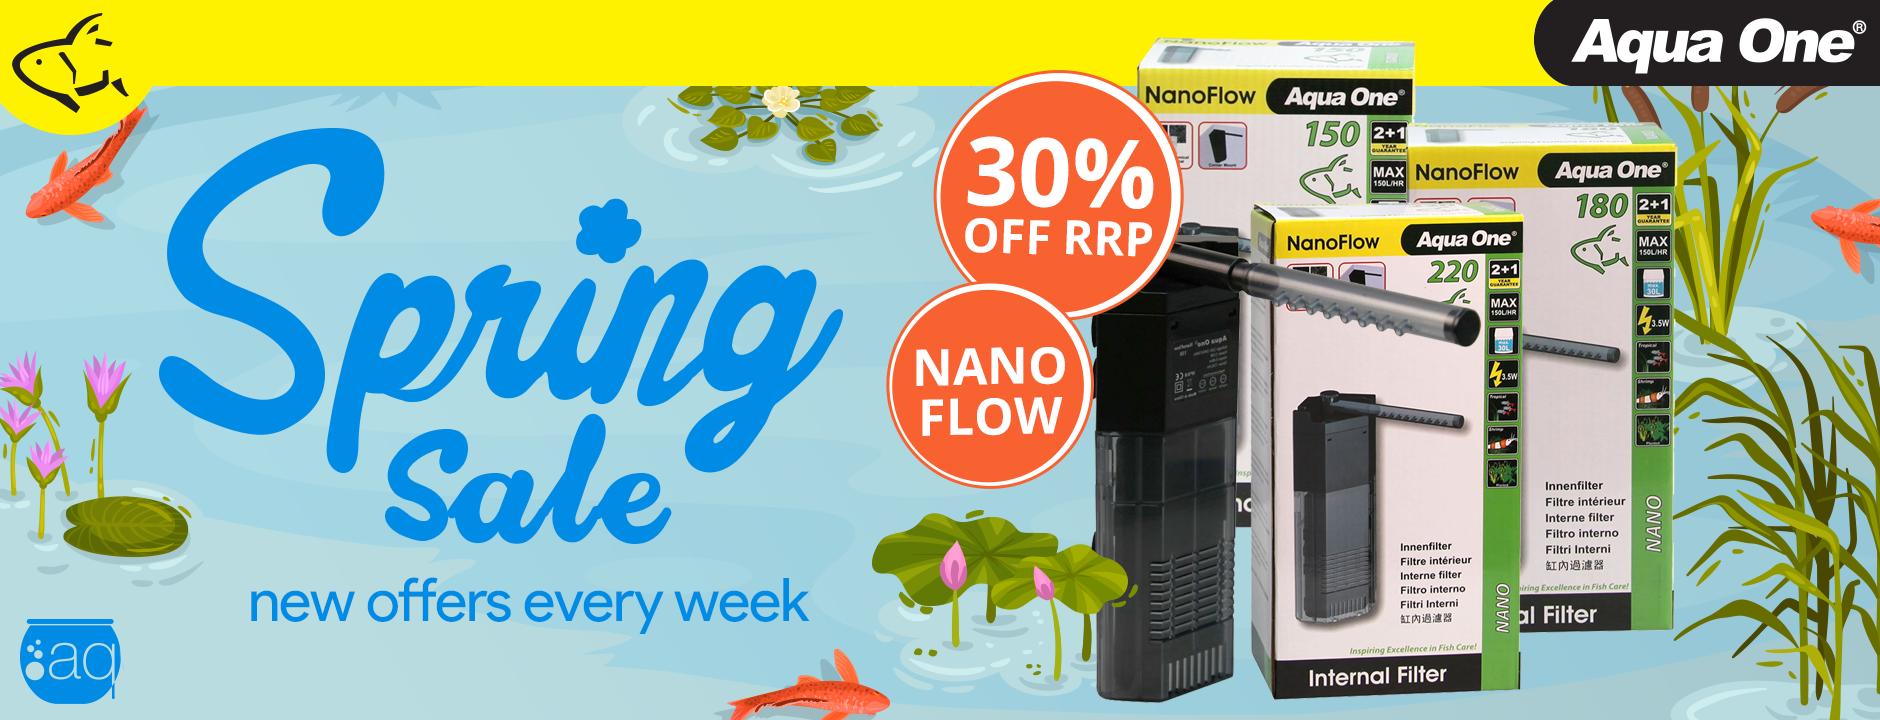 nano-flo-offer-banner.png